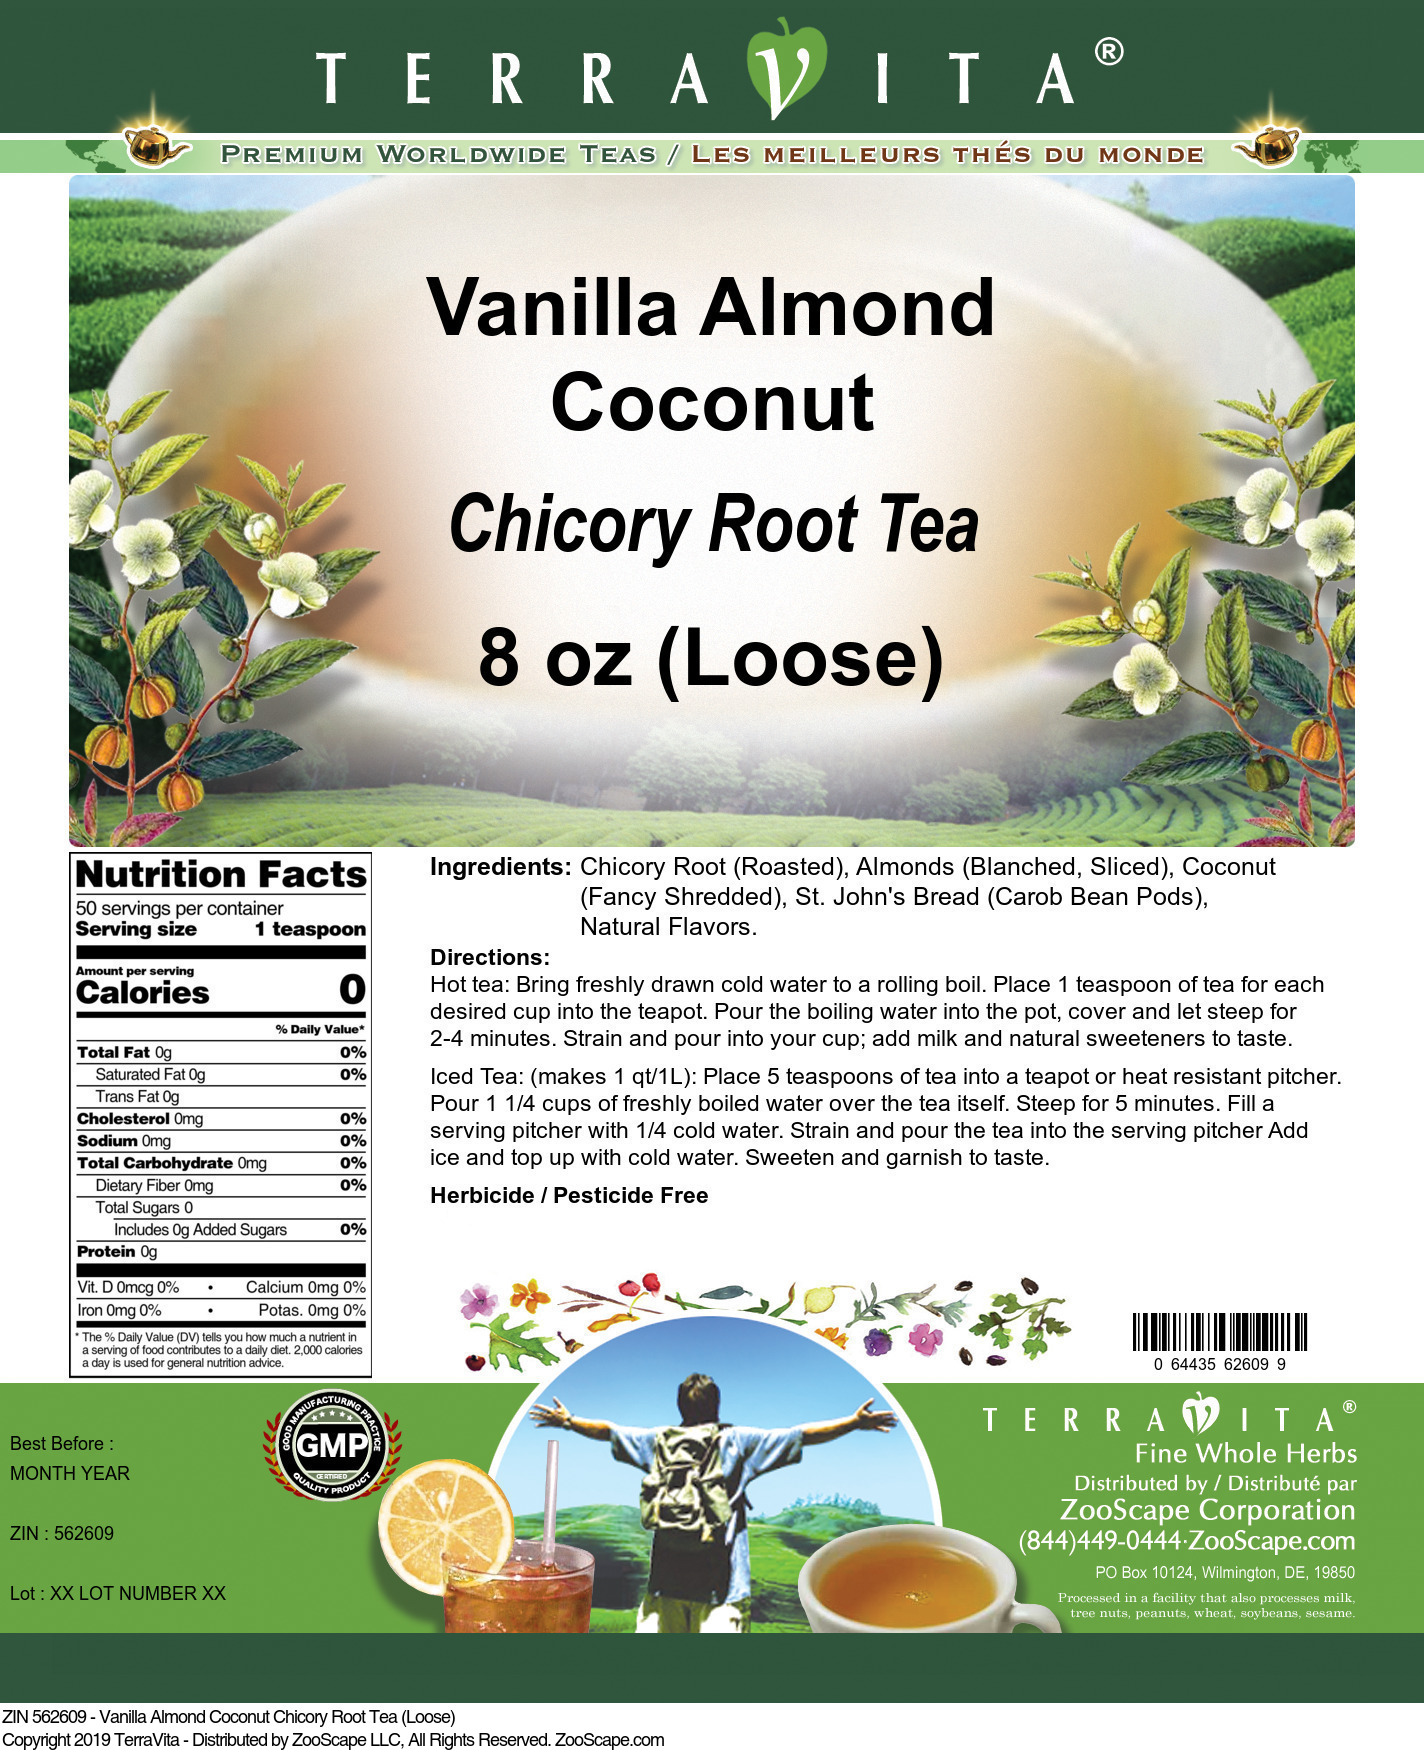 Vanilla Almond Coconut Chicory Root